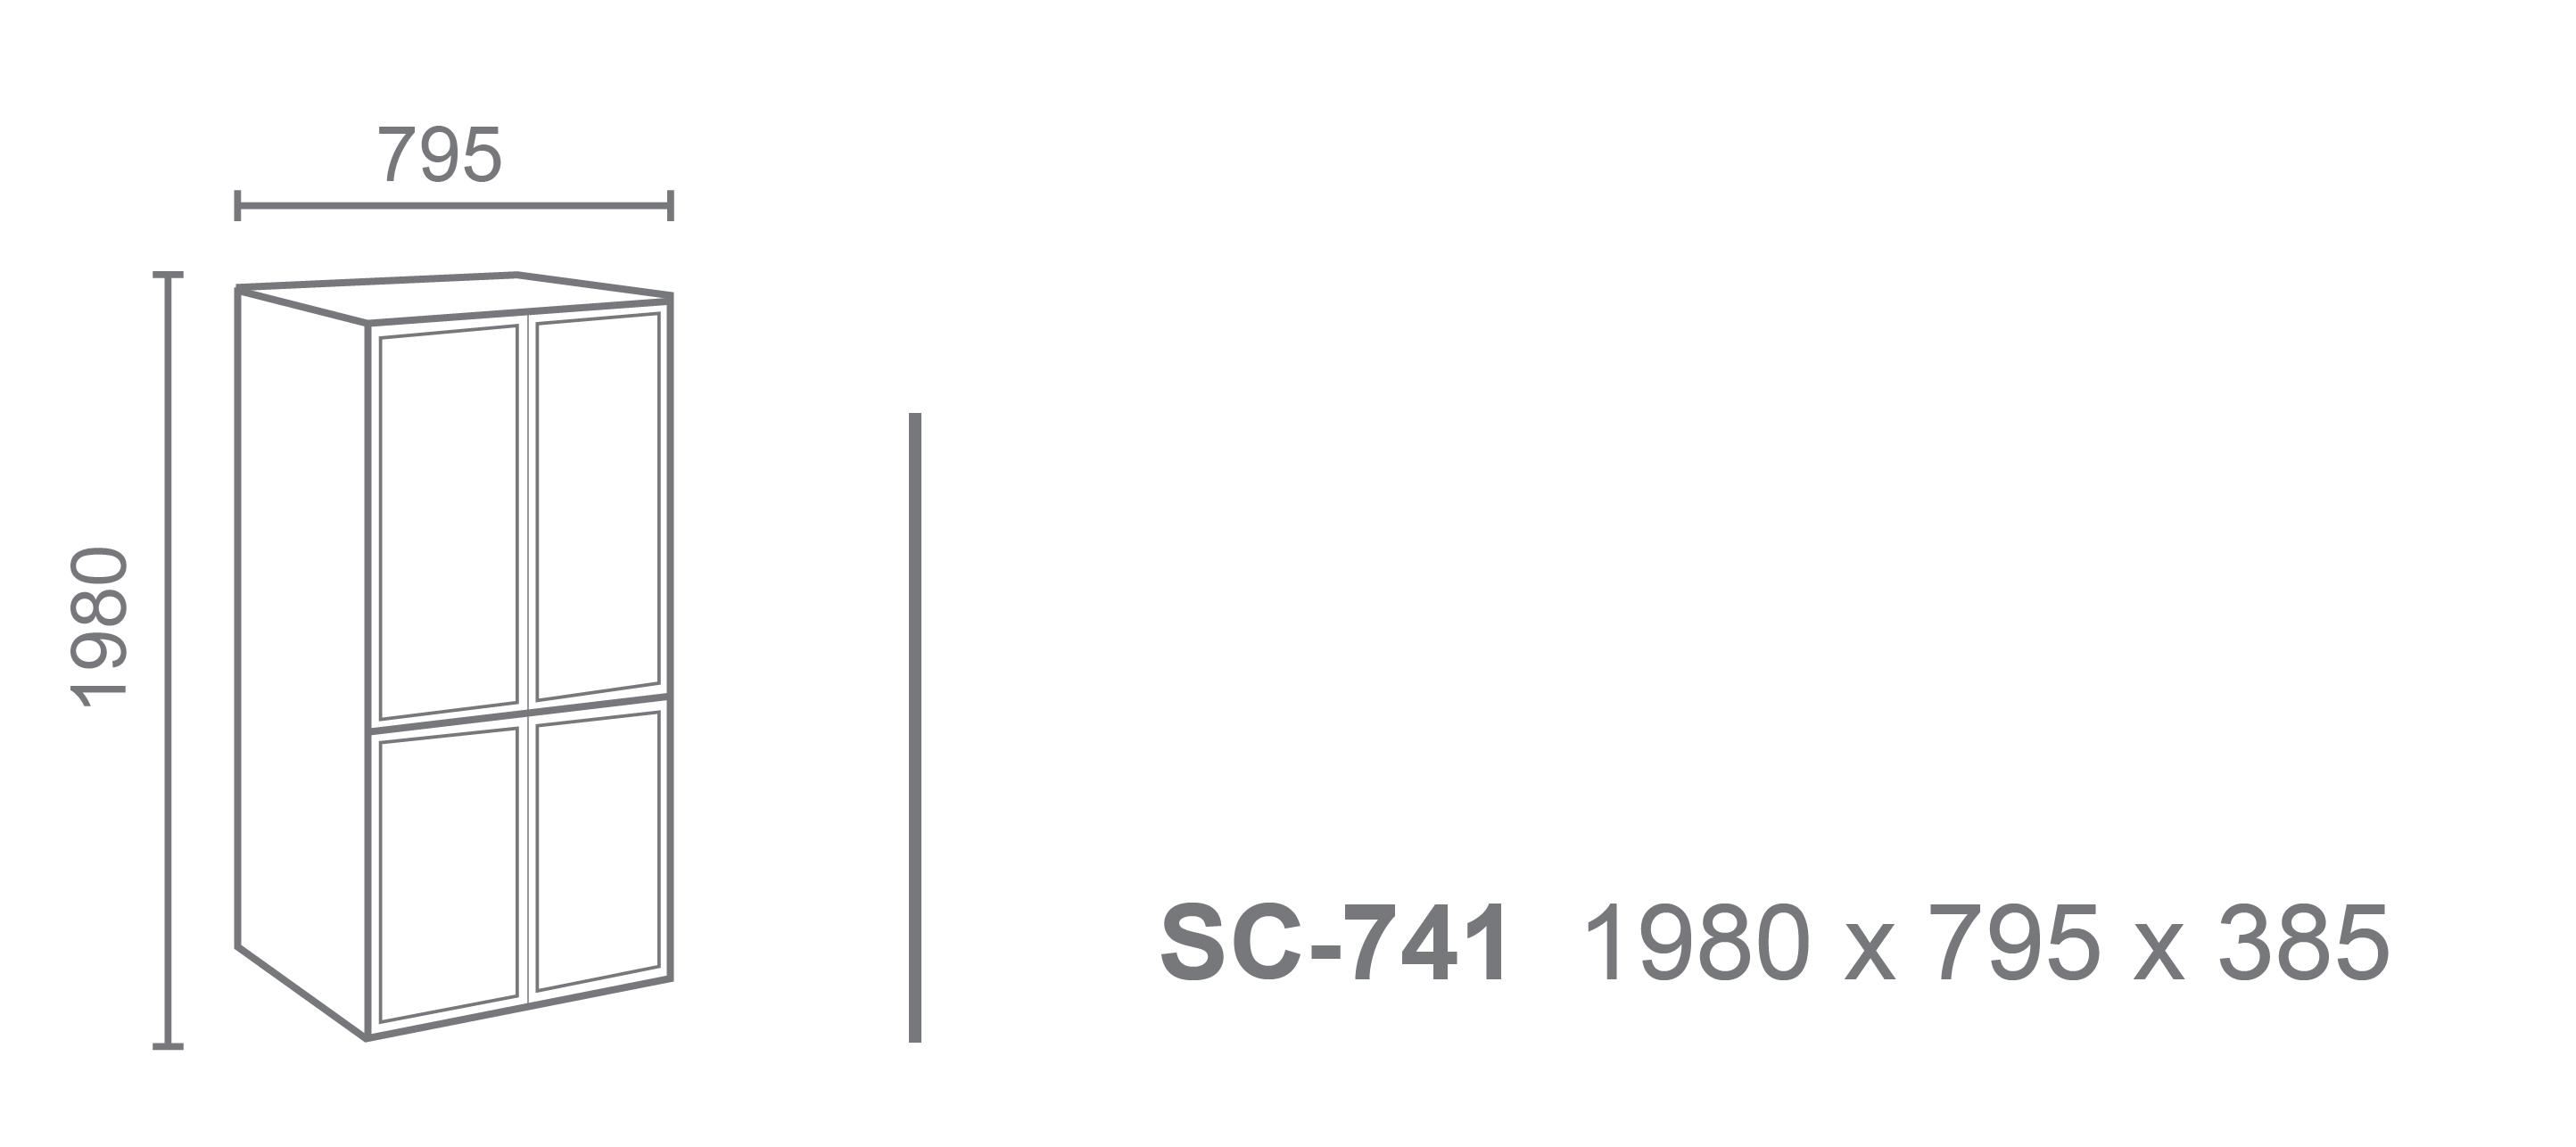 SC-741